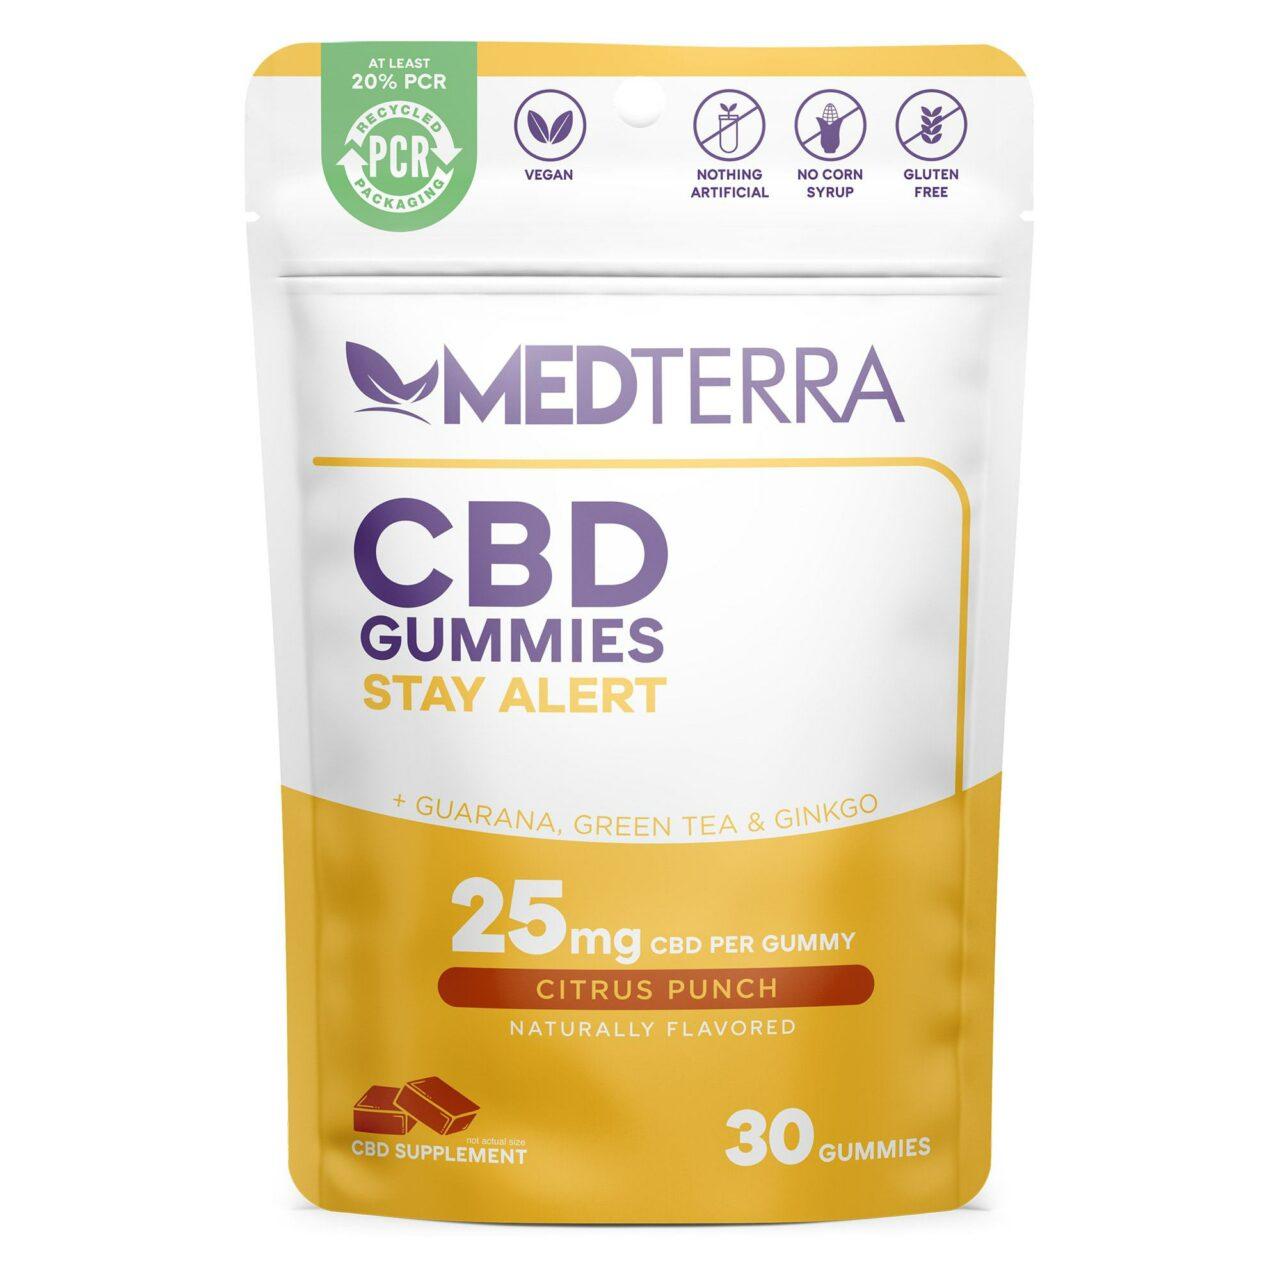 Medterra, CBD Gummies, Stay Alert, Isolate THC-Free, Citrus Punch, 30ct, 750mg CBD 1